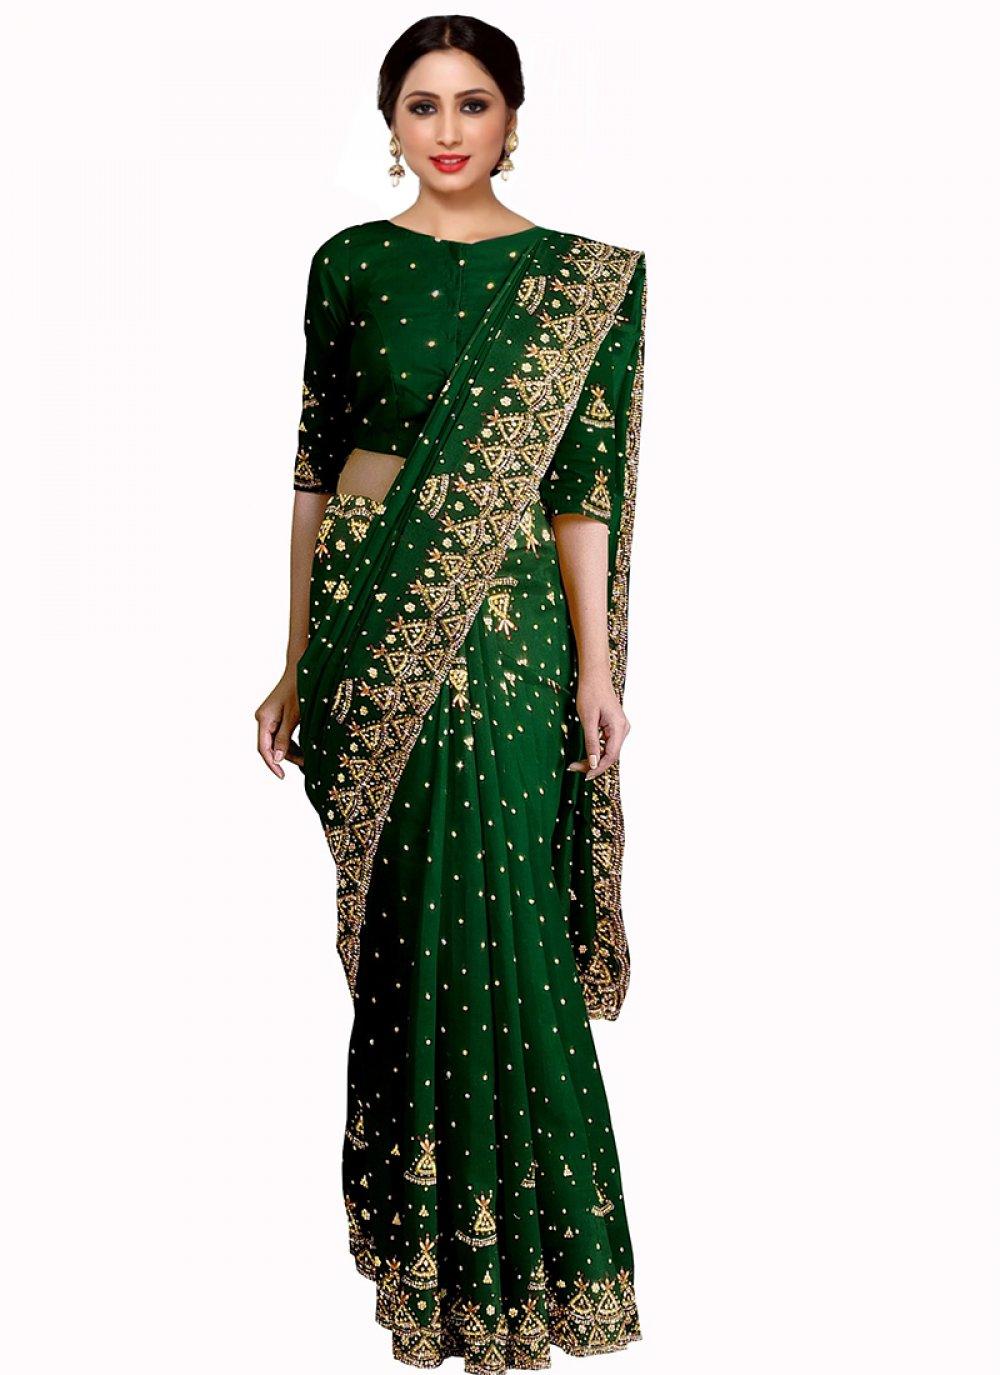 Green Georgette Mehndi Saree